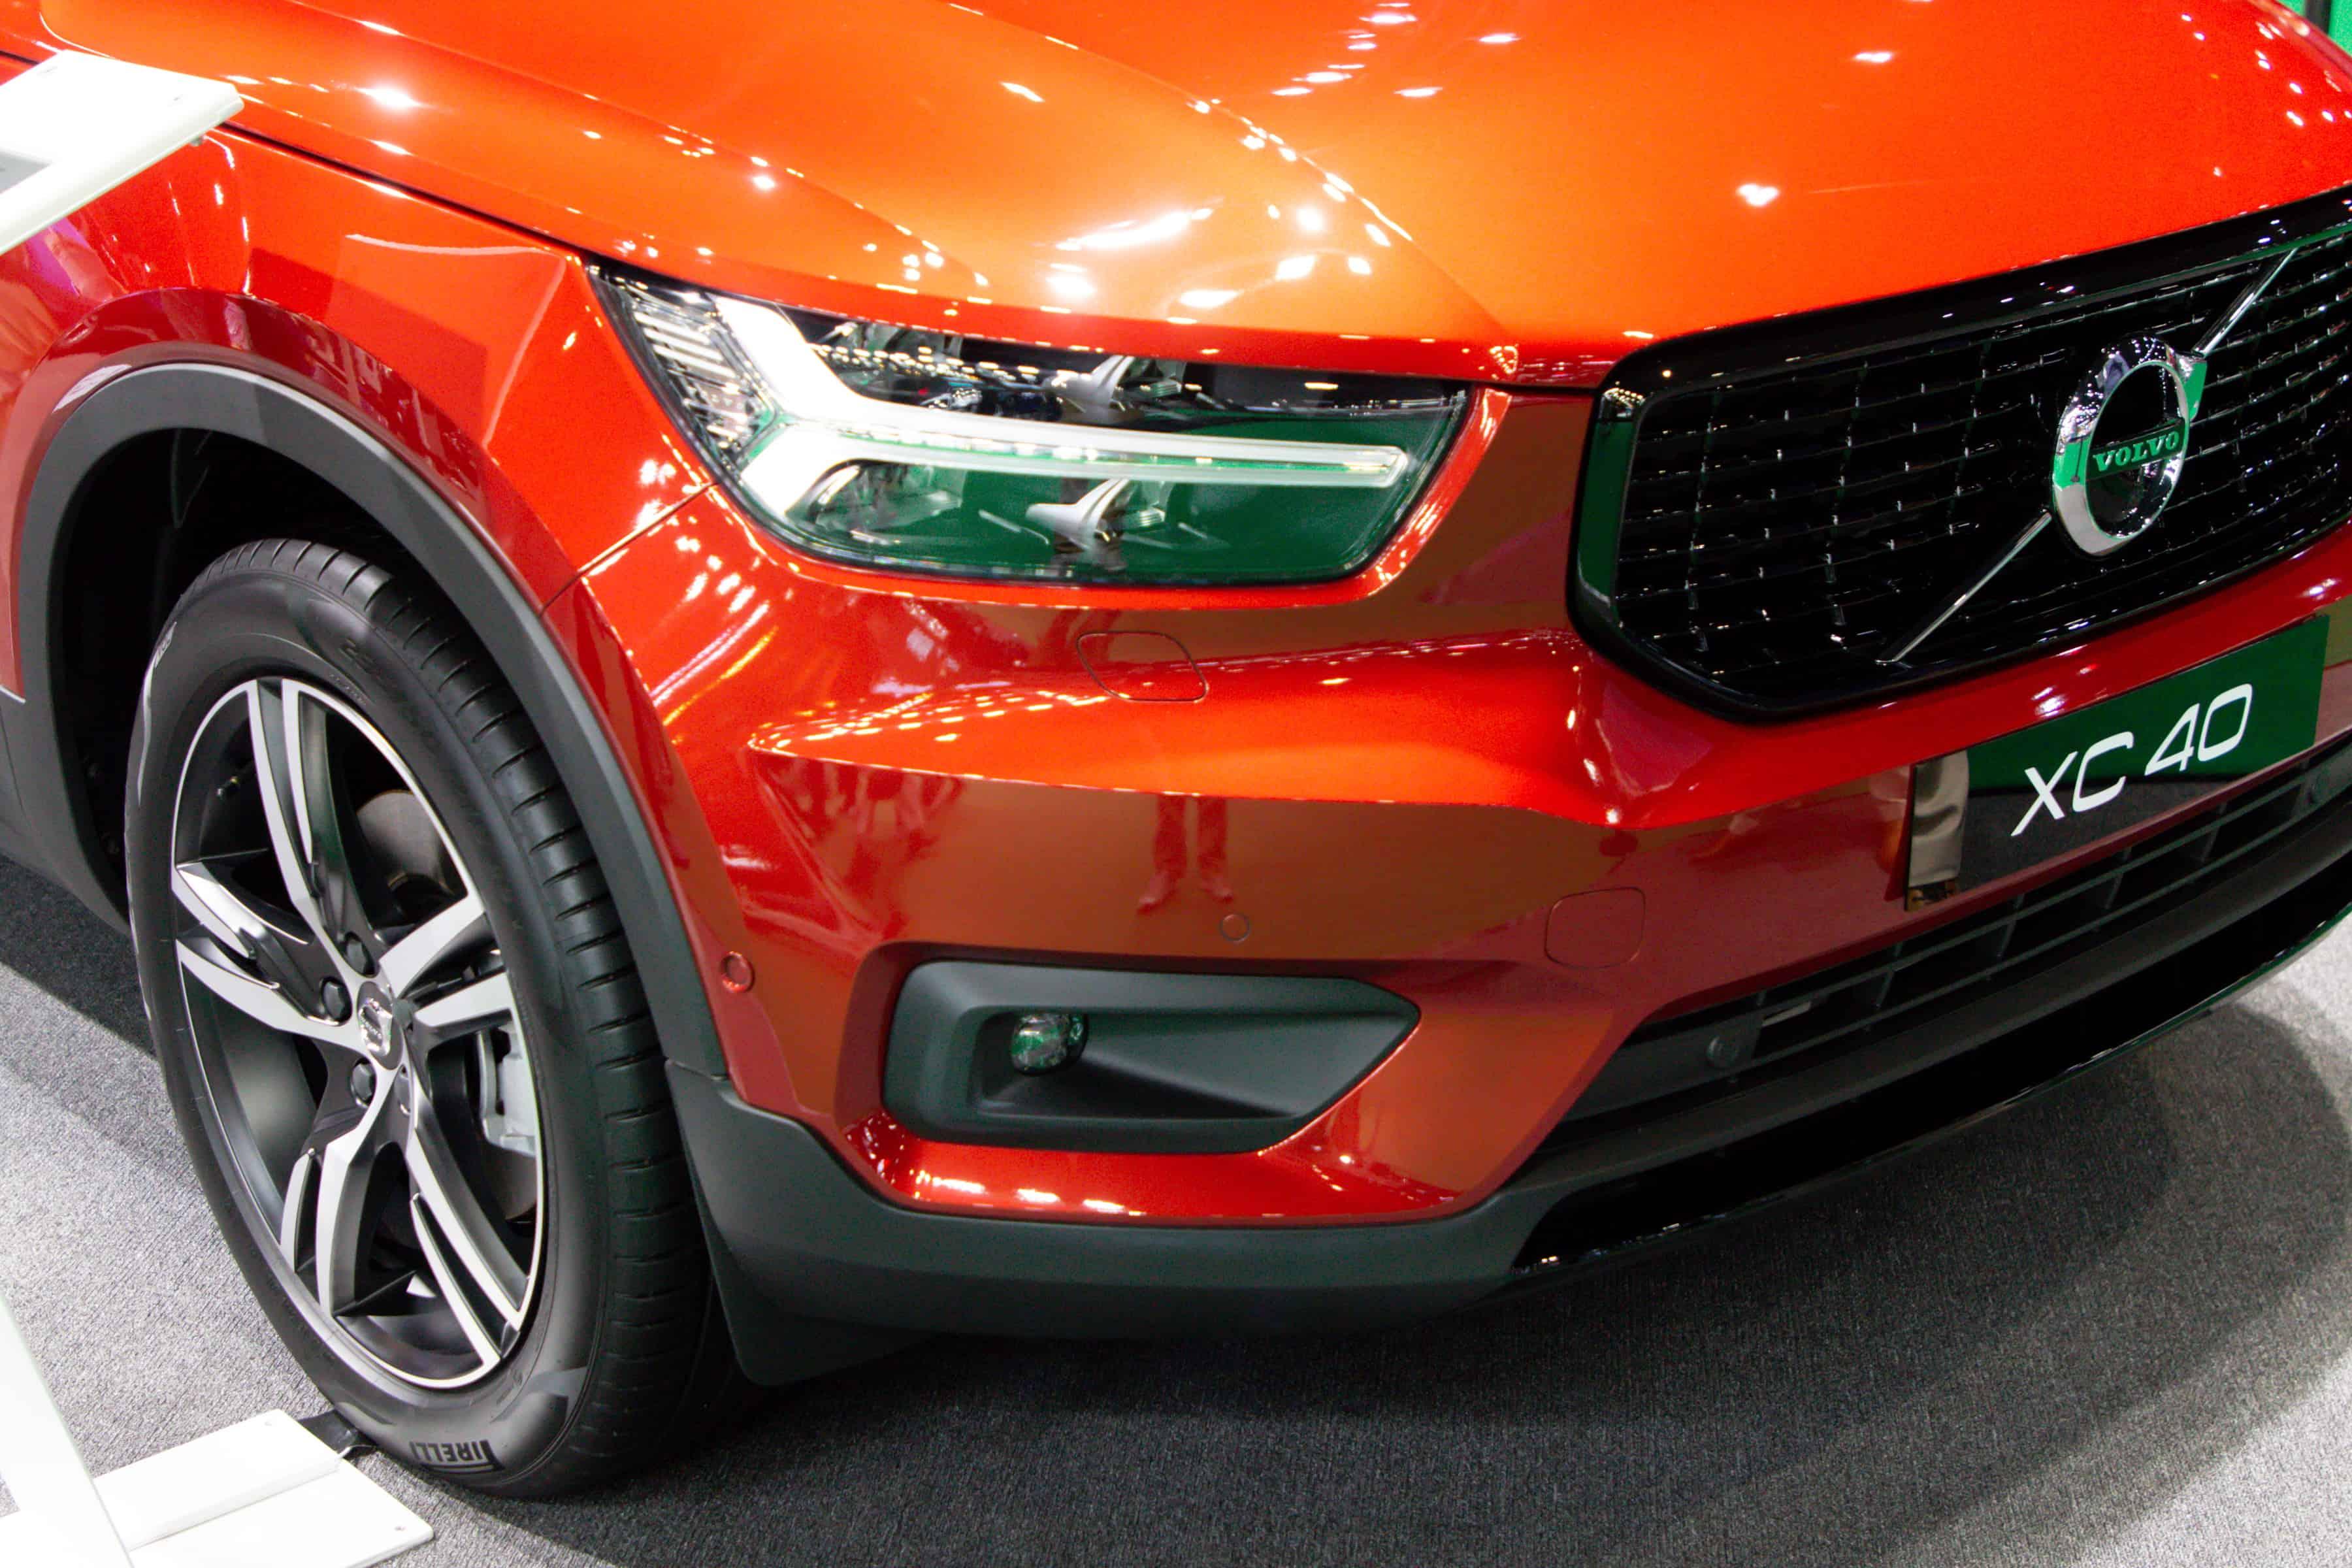 Rear Seat Lock Striker Issue Causes Volvo Recall